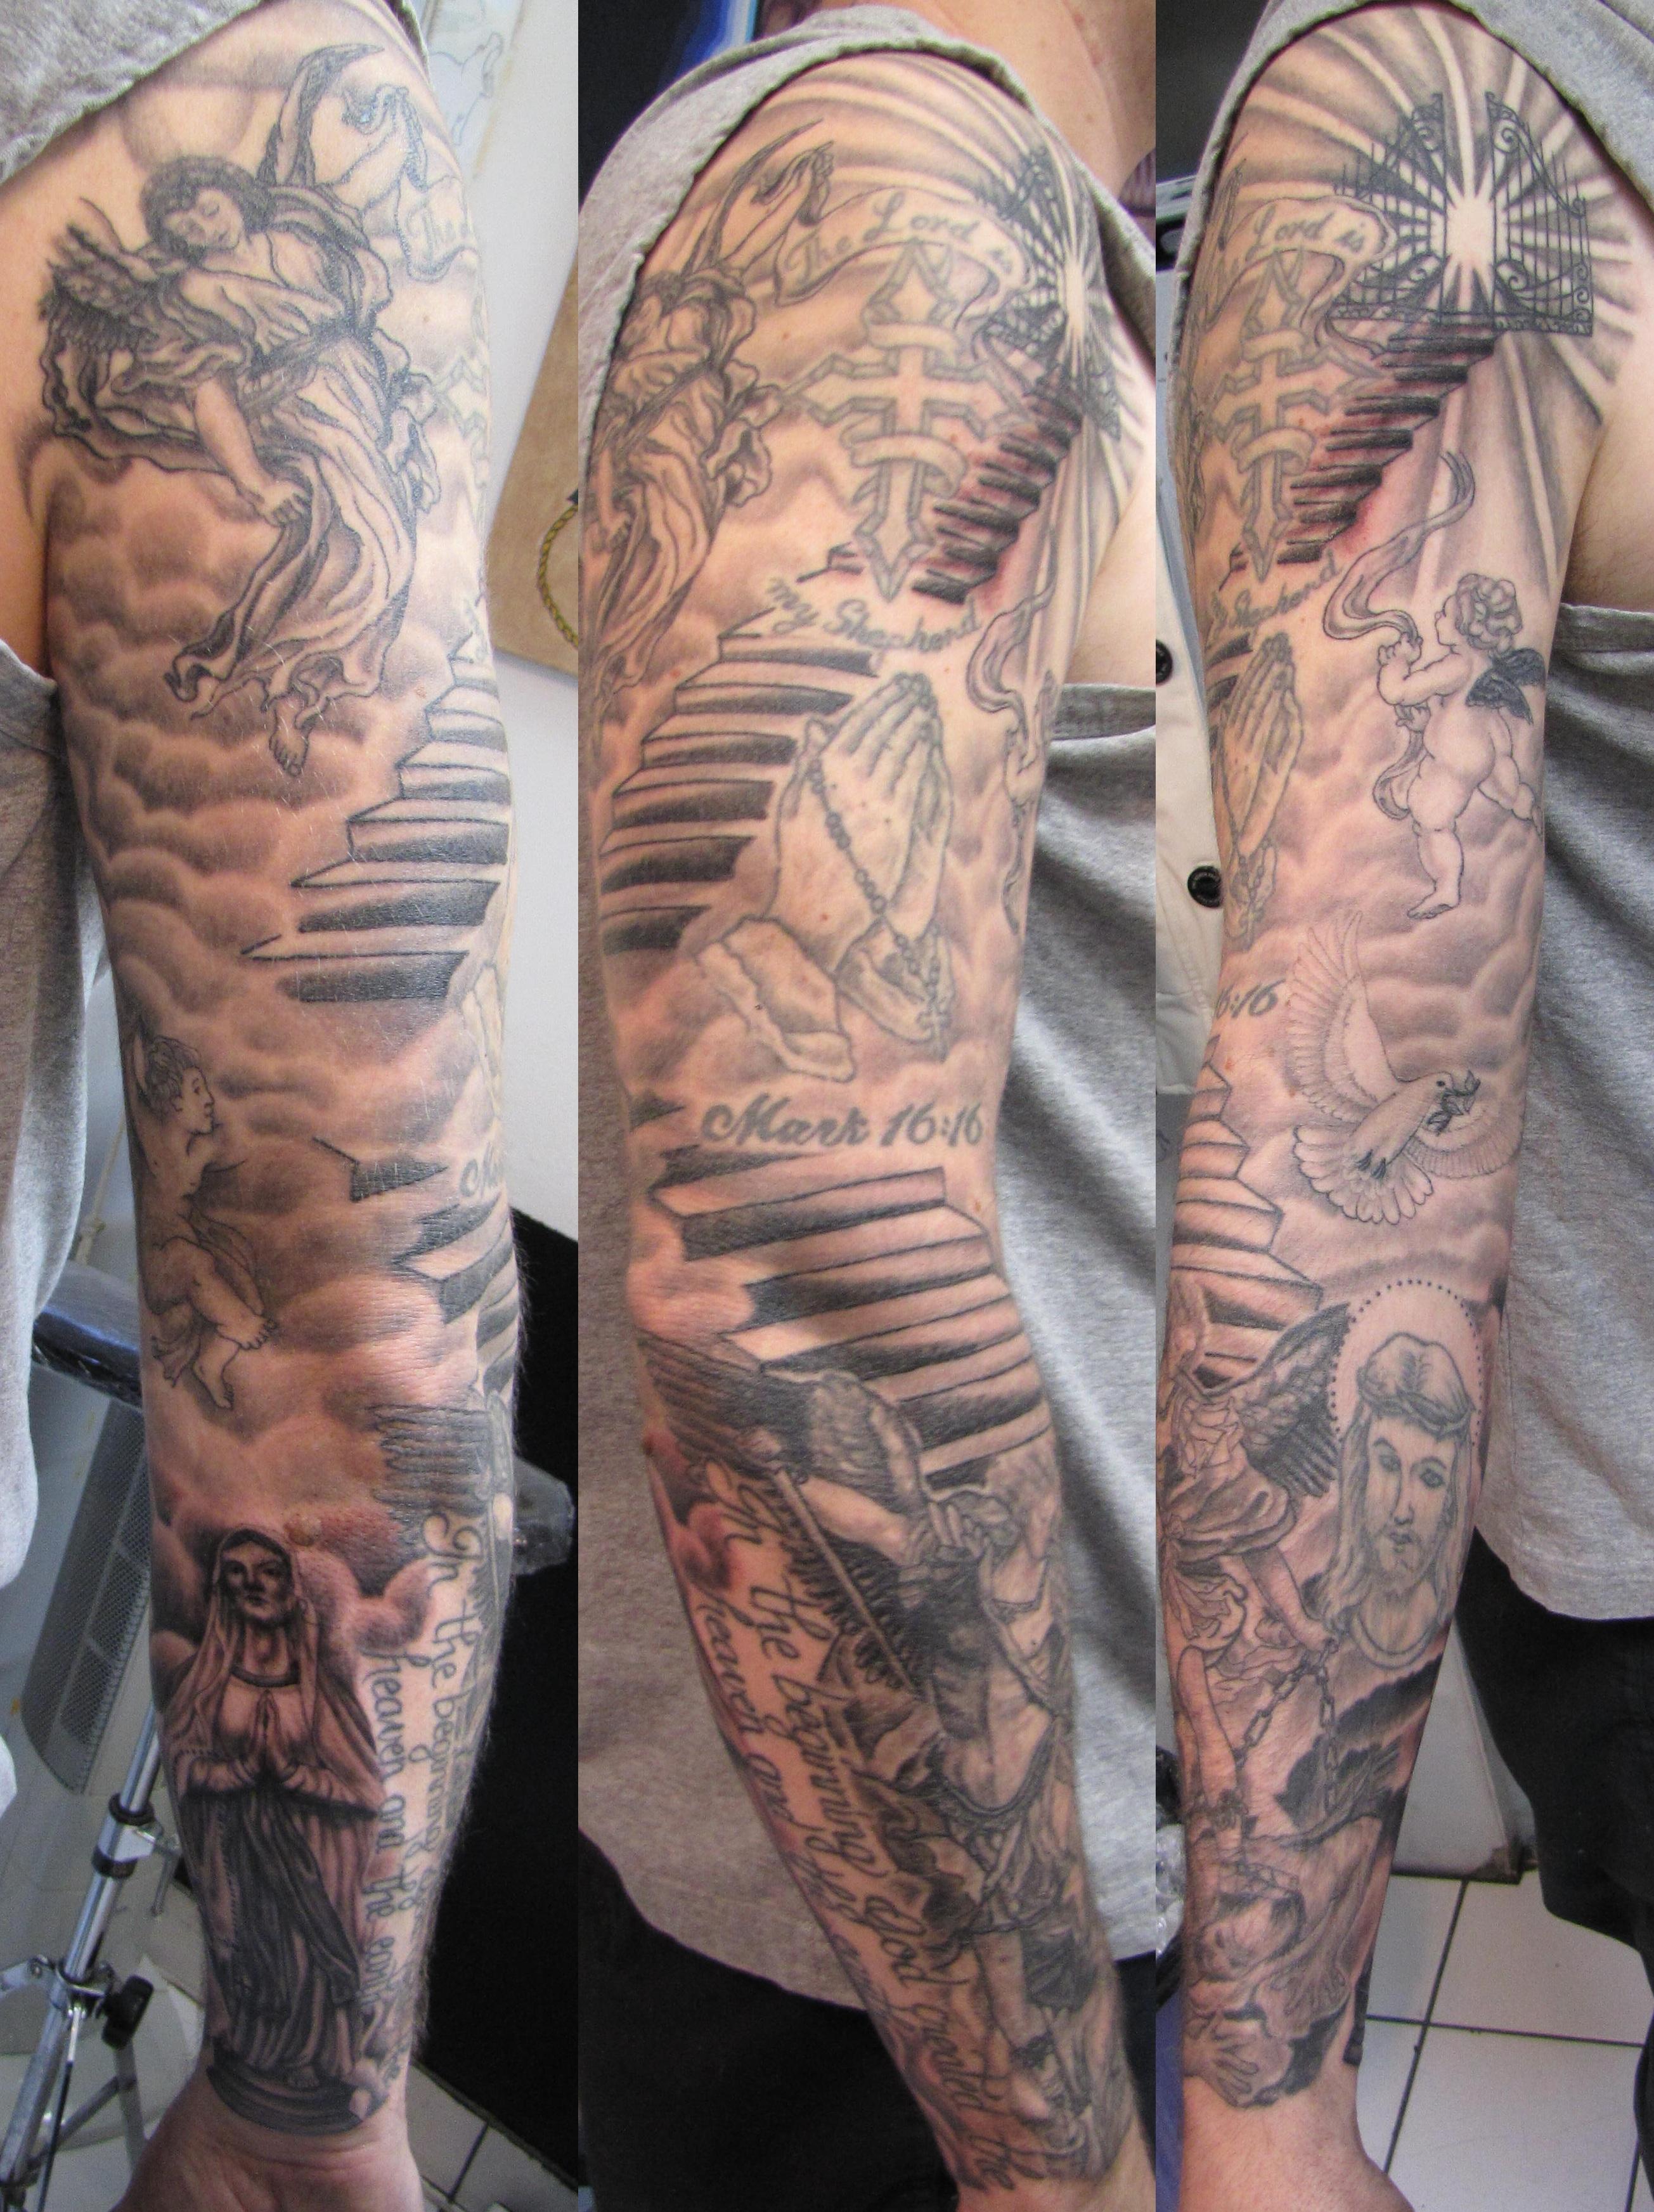 26 Angel Sleeve Tattoos Ideas regarding measurements 2609 X 3489